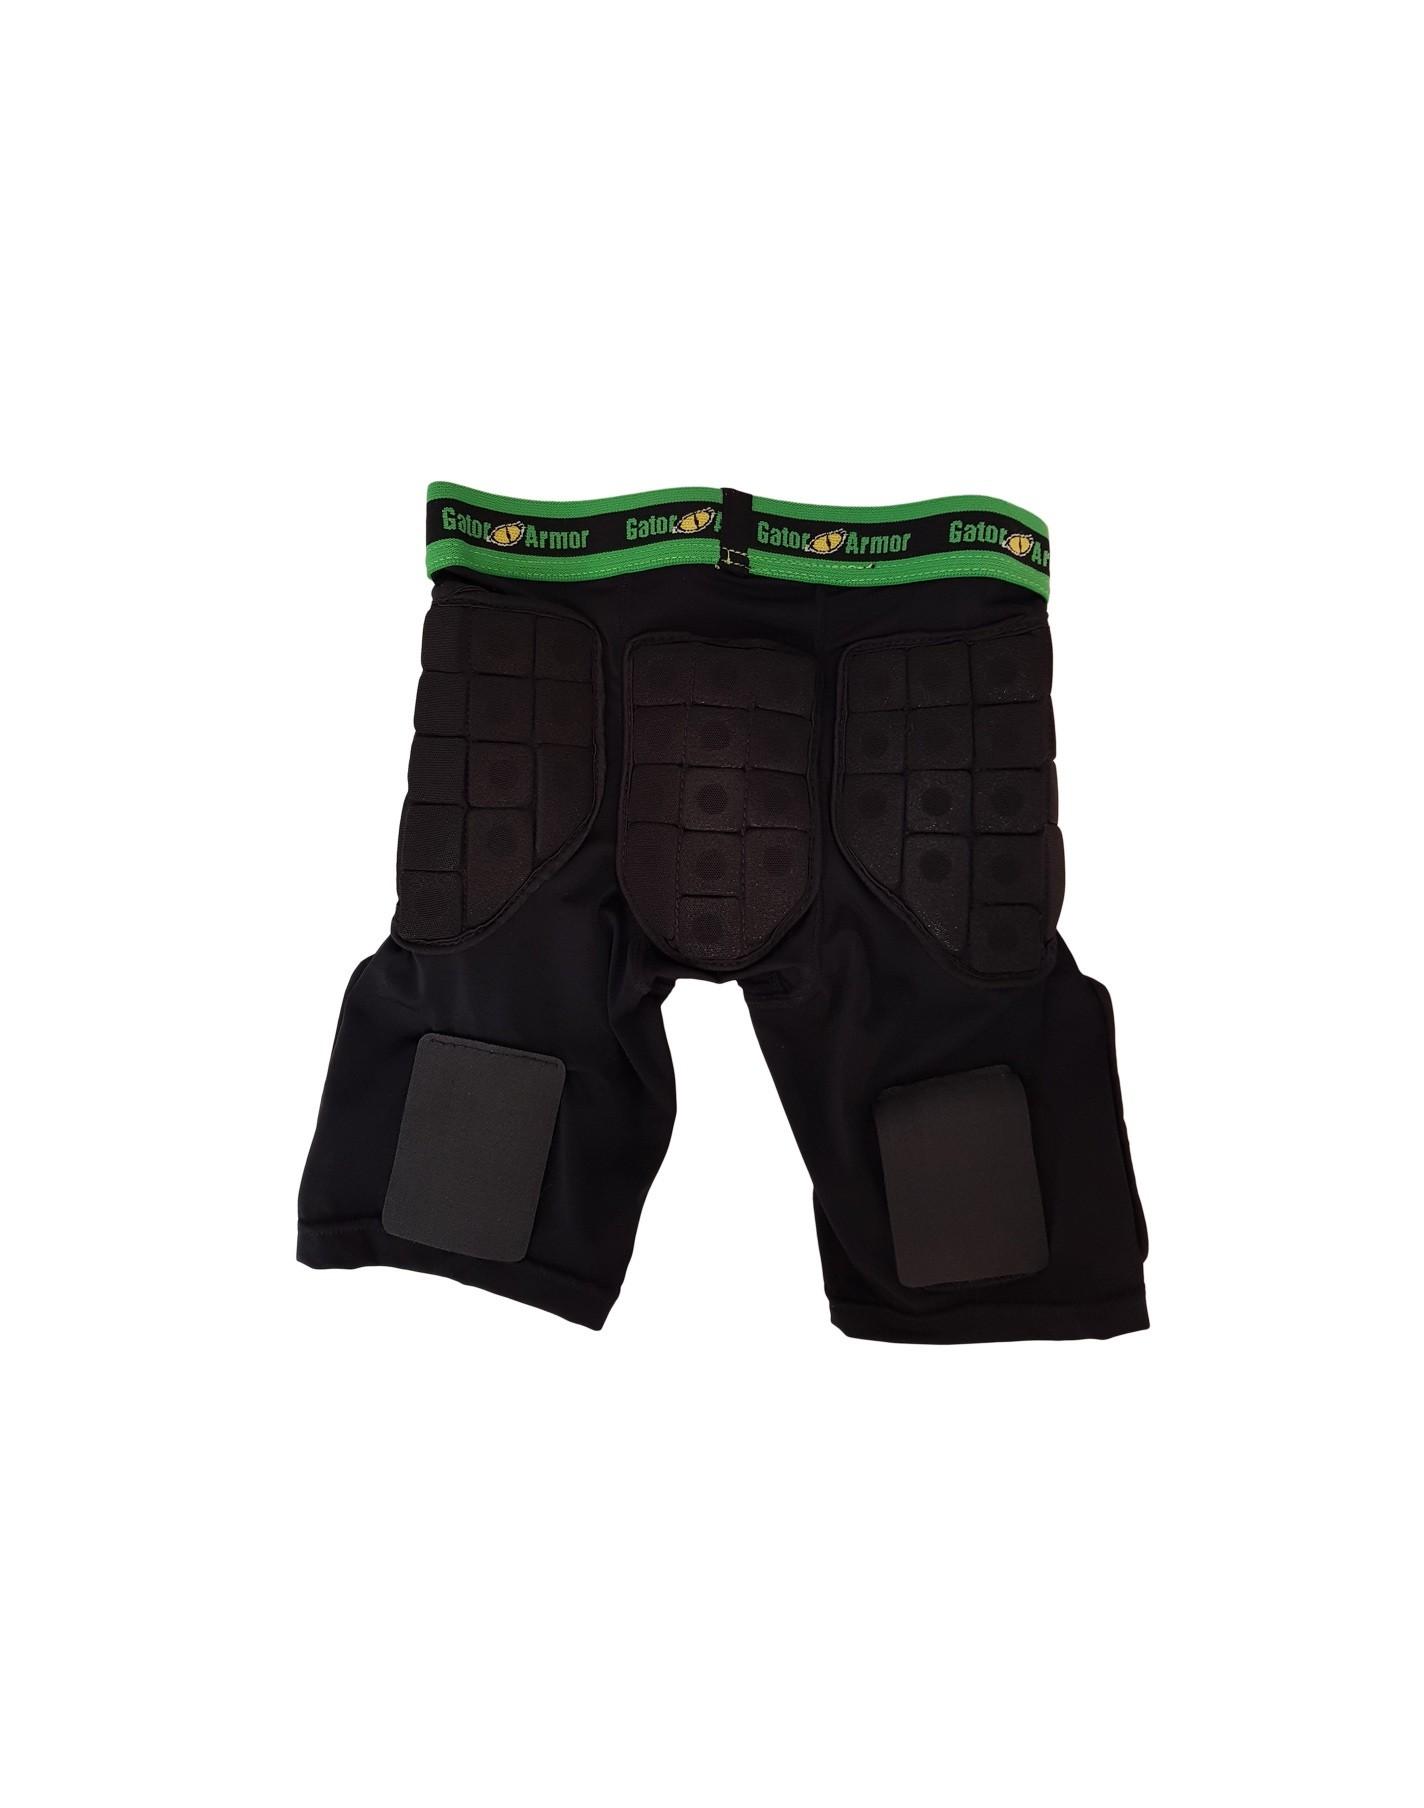 GATOR ARMOR GA90 Youth Underwear Shorts